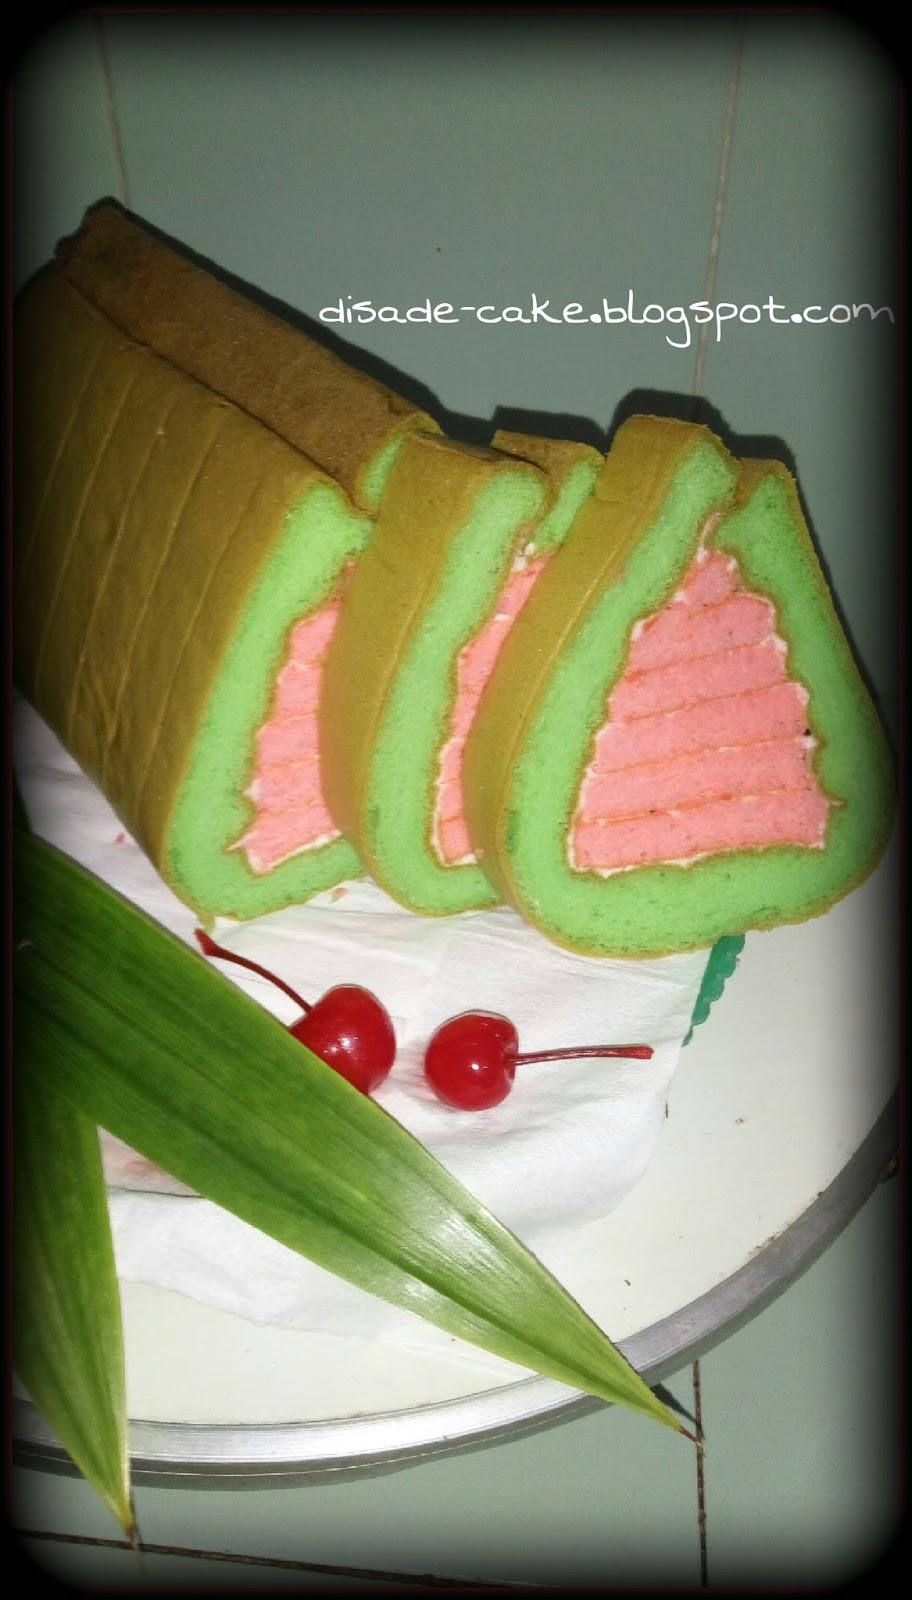 Cake Tart Pudding Cookies Pyramid Roll Cake Roti Gulung Piramida